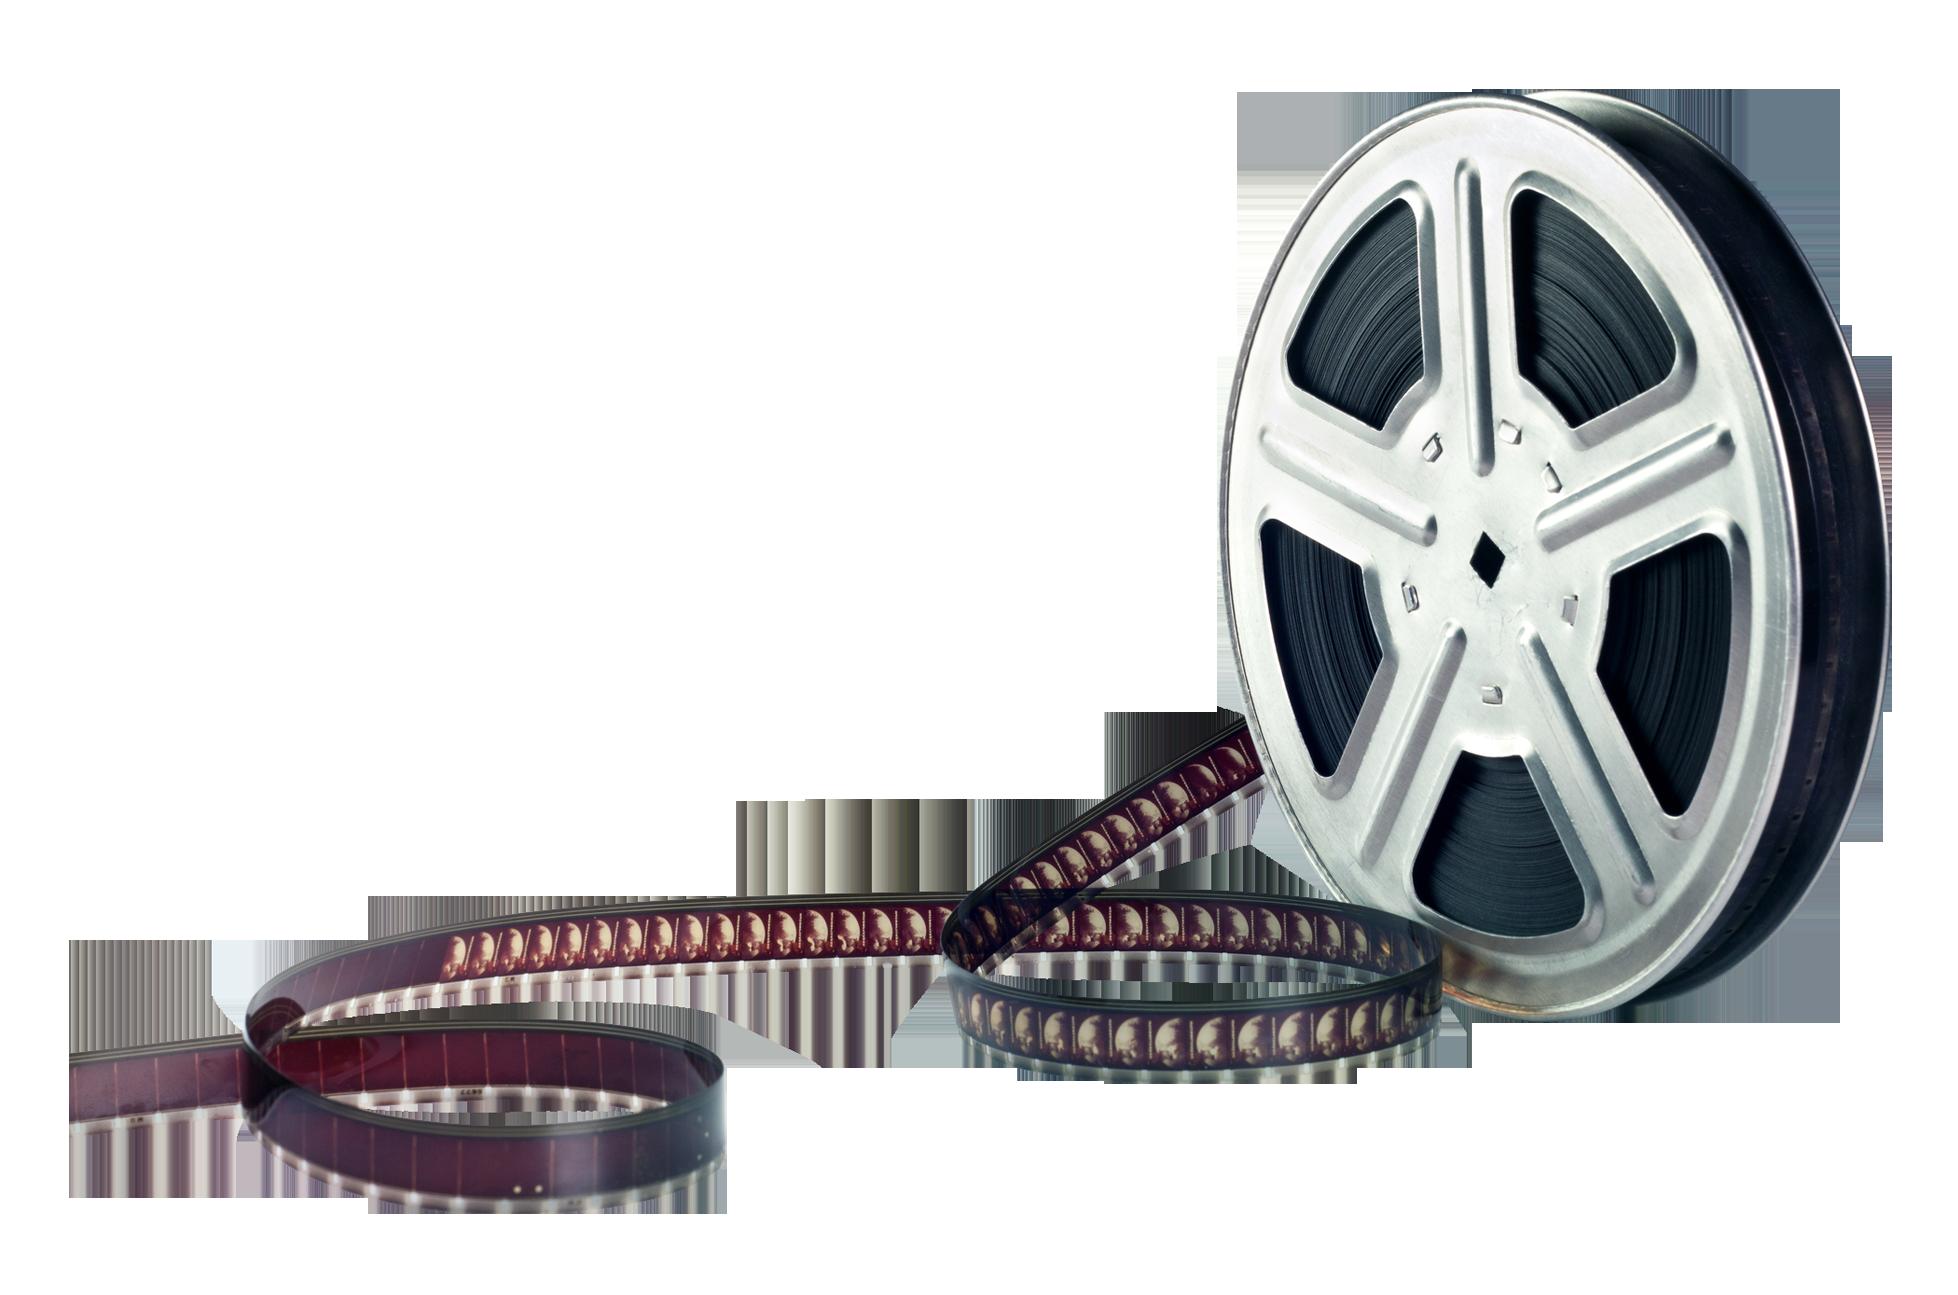 Film Reel PNG Image.